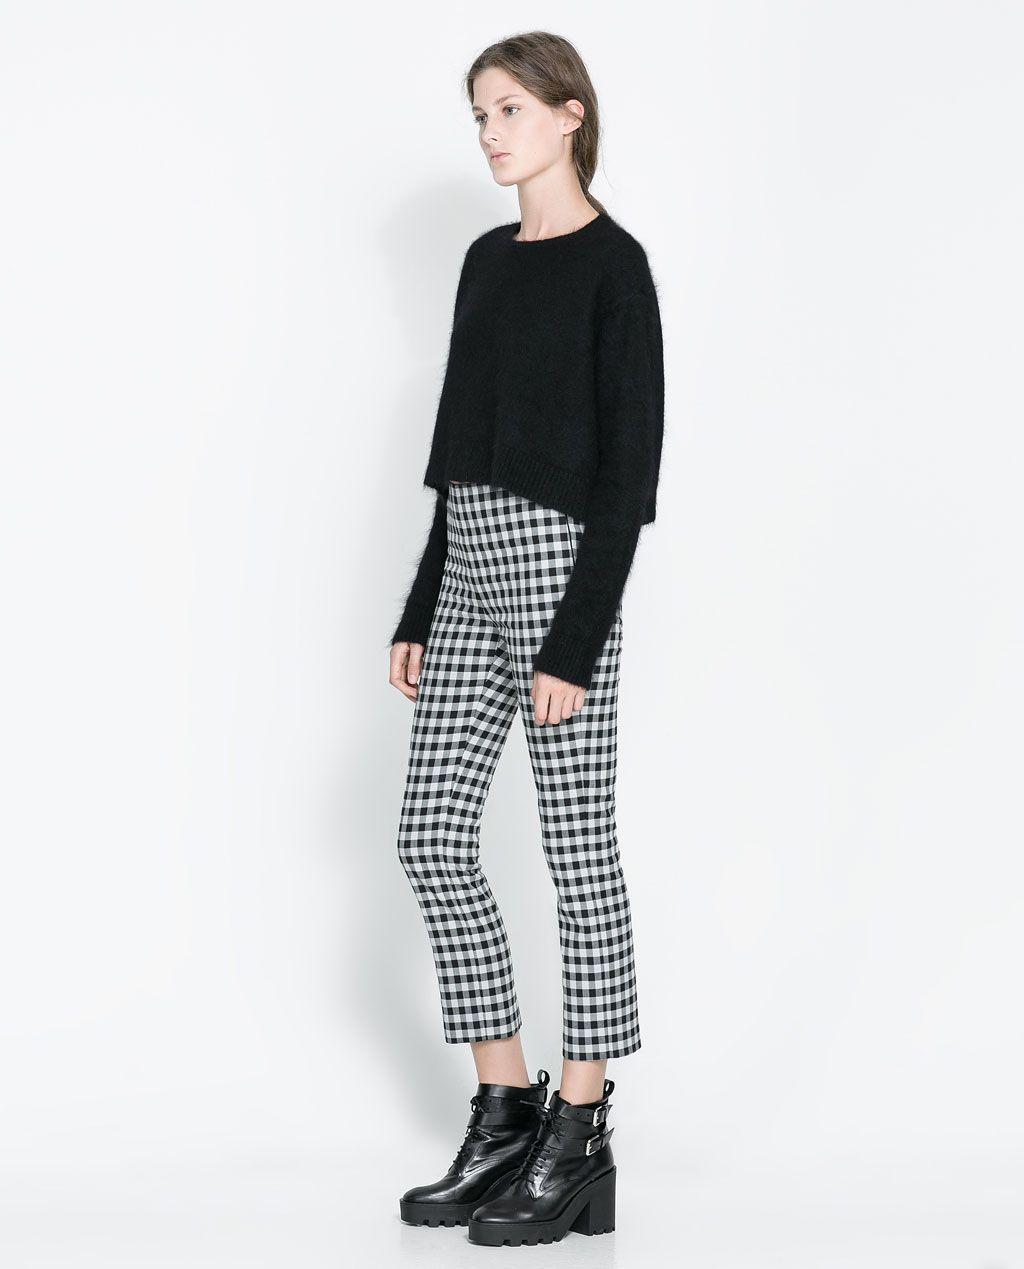 http://www.zara.com/us/en/woman/trousers/checkered-trousers-c269187p1522002.html